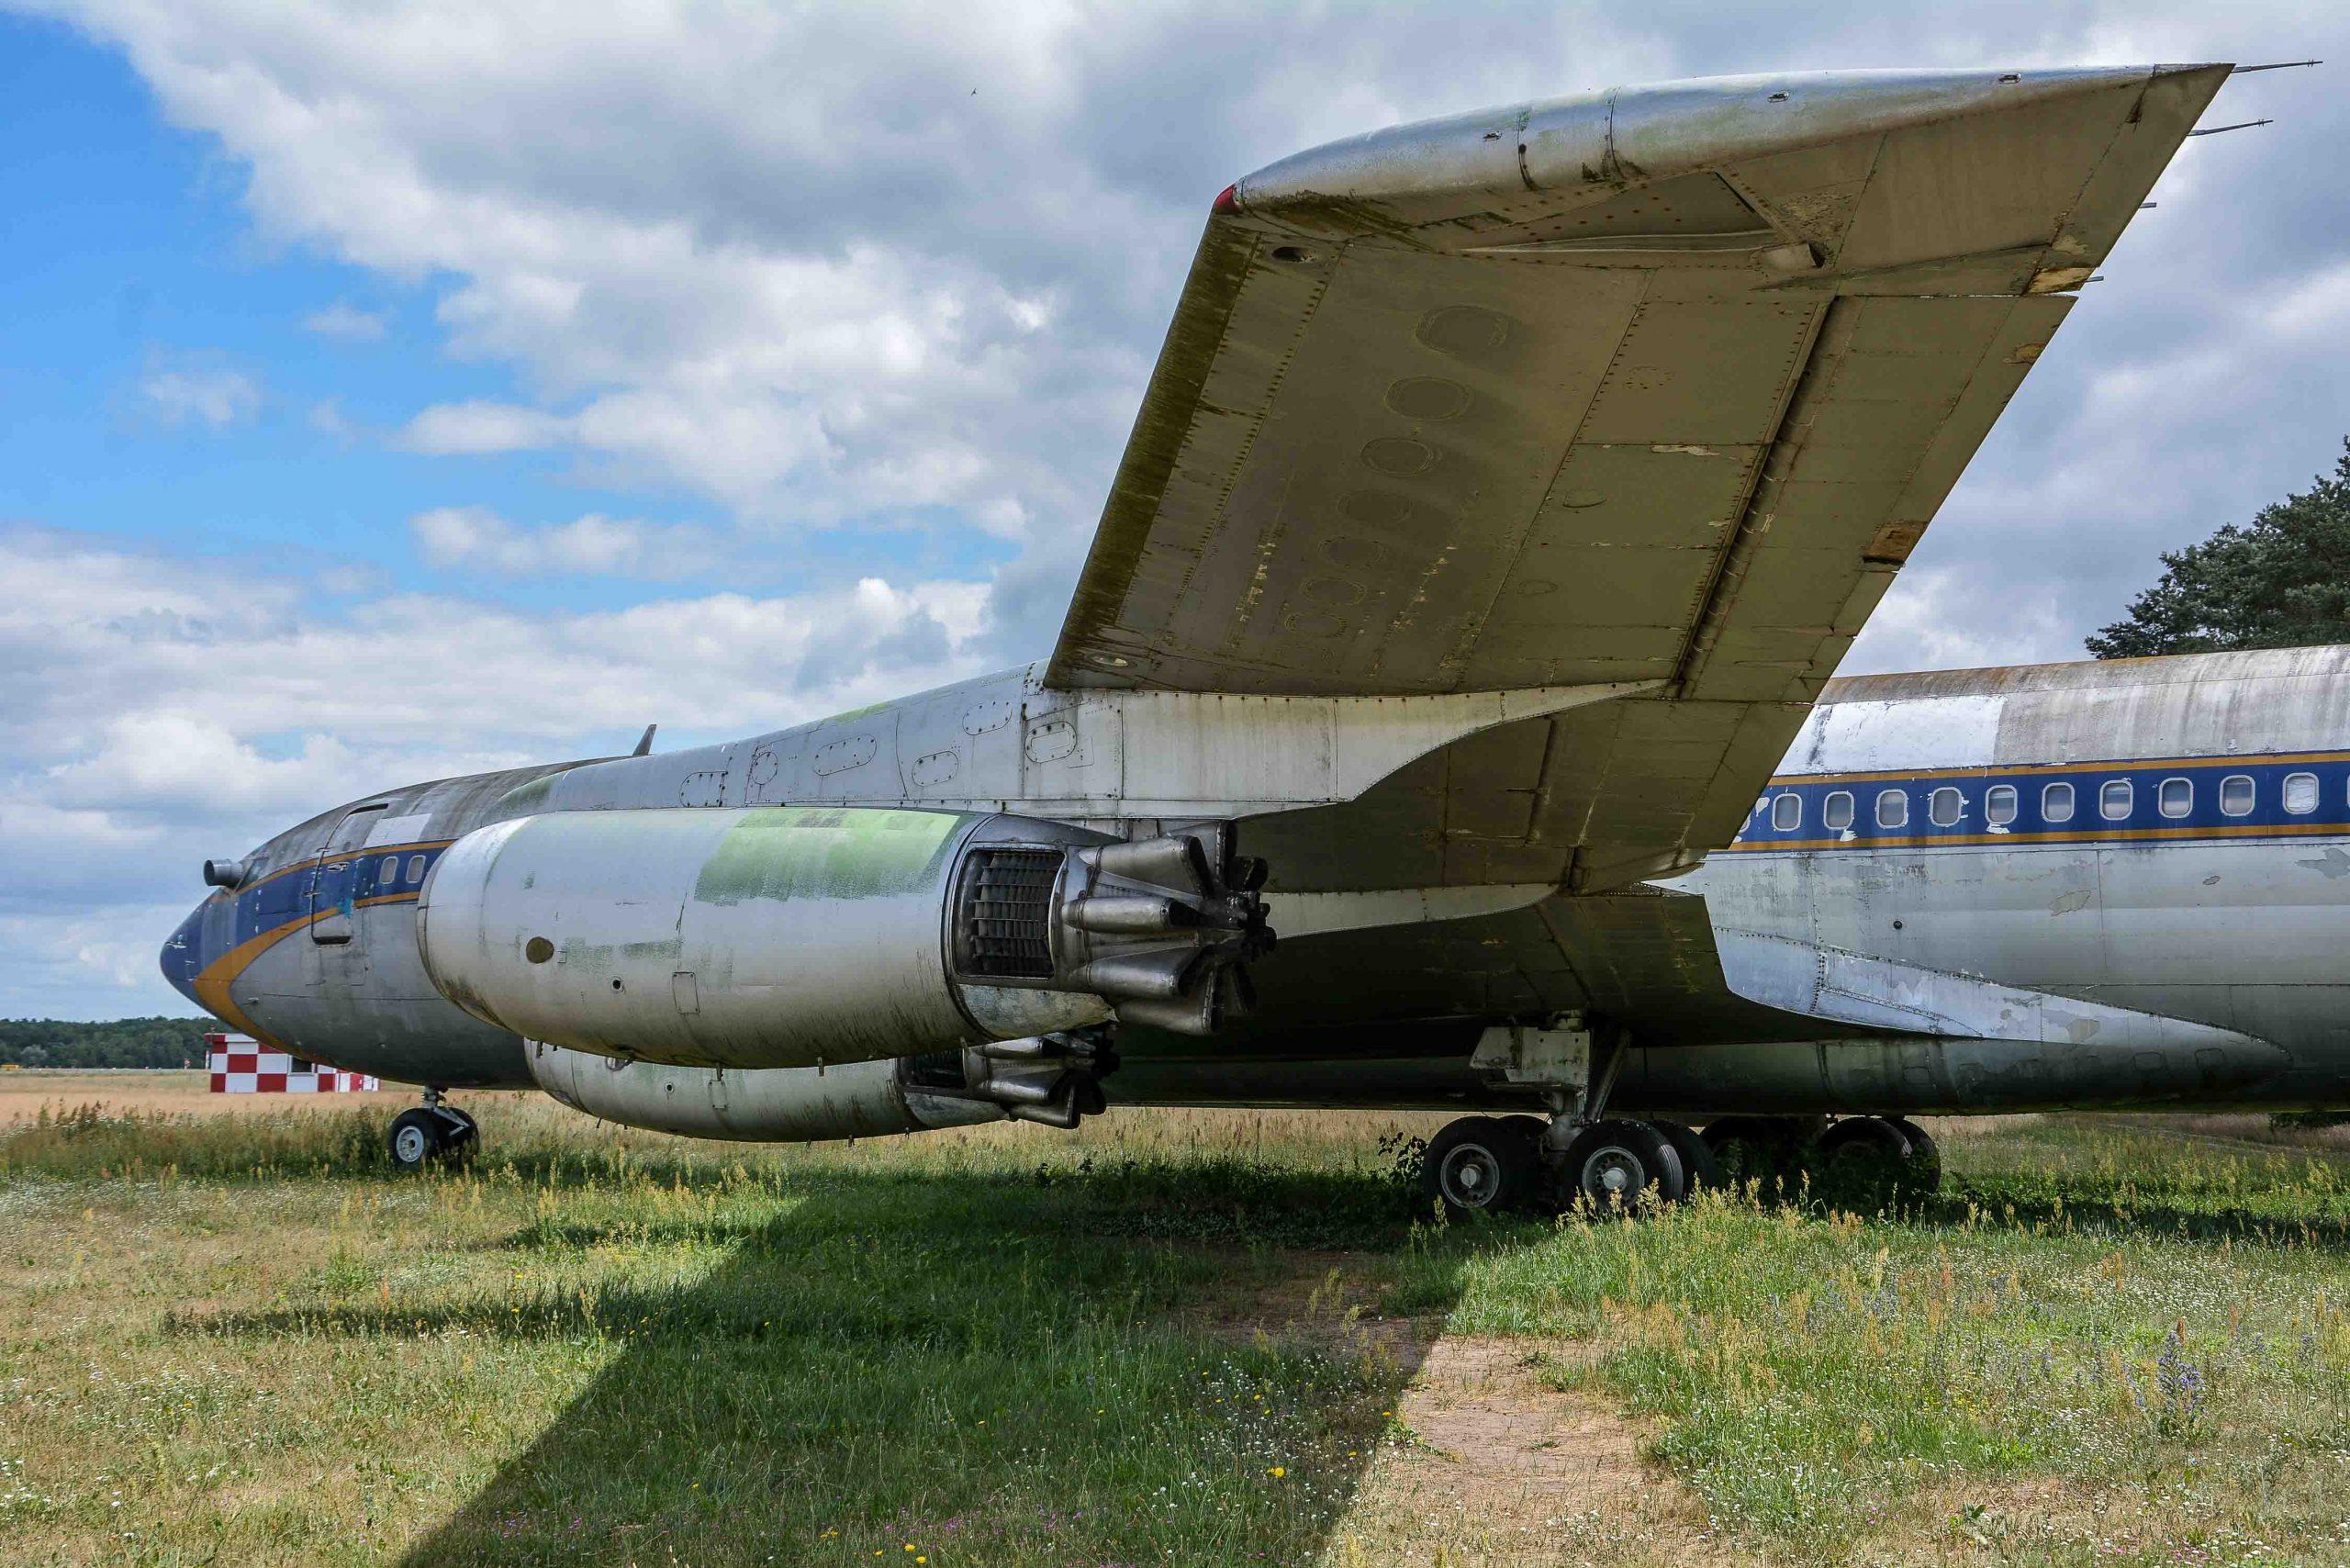 wing turbines abandoned boeing 707 tegel txl flughafen airport berlin germany deutschland